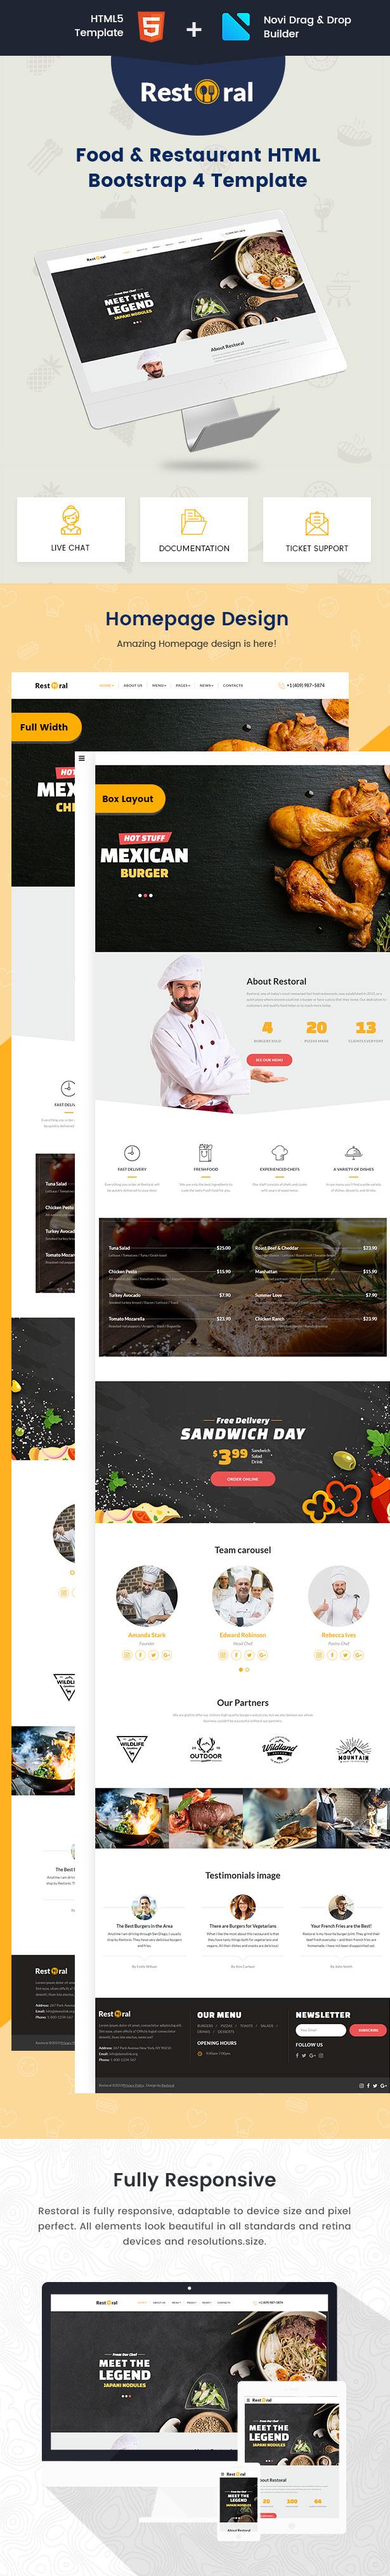 Restoral - Food & Restaurant HTML Responsive Bootstrap 4 Template - 1